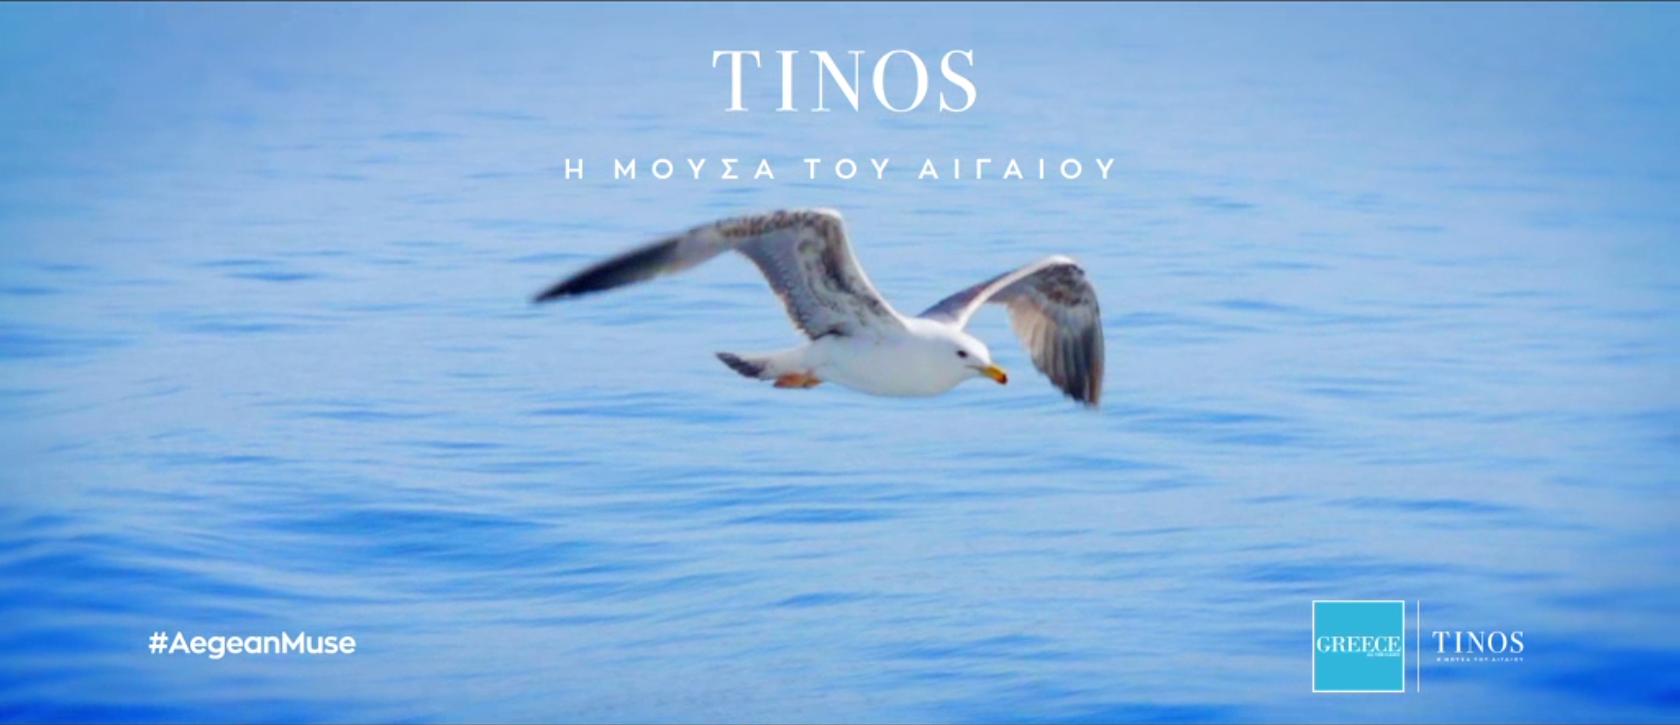 Tinos - Η Μούσα του Αιγαίου